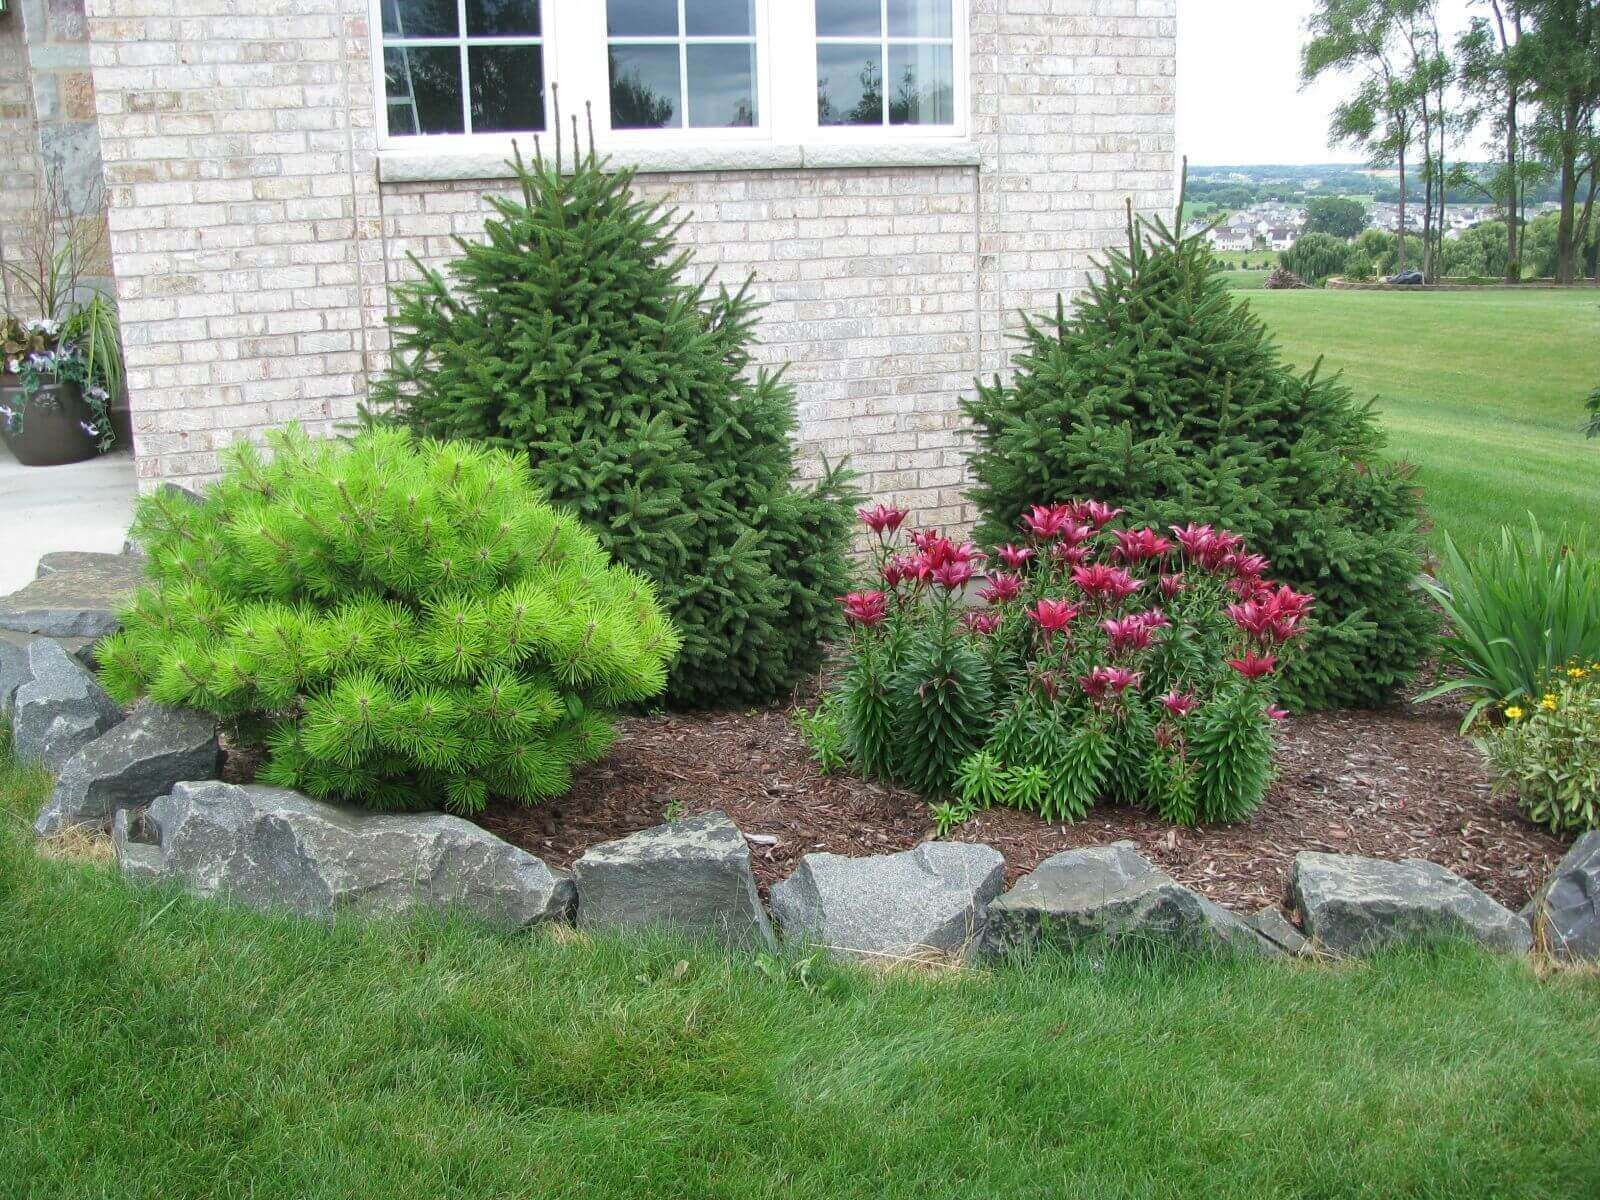 68 Lawn Edging Ideas That Will Transform Your Garden ...